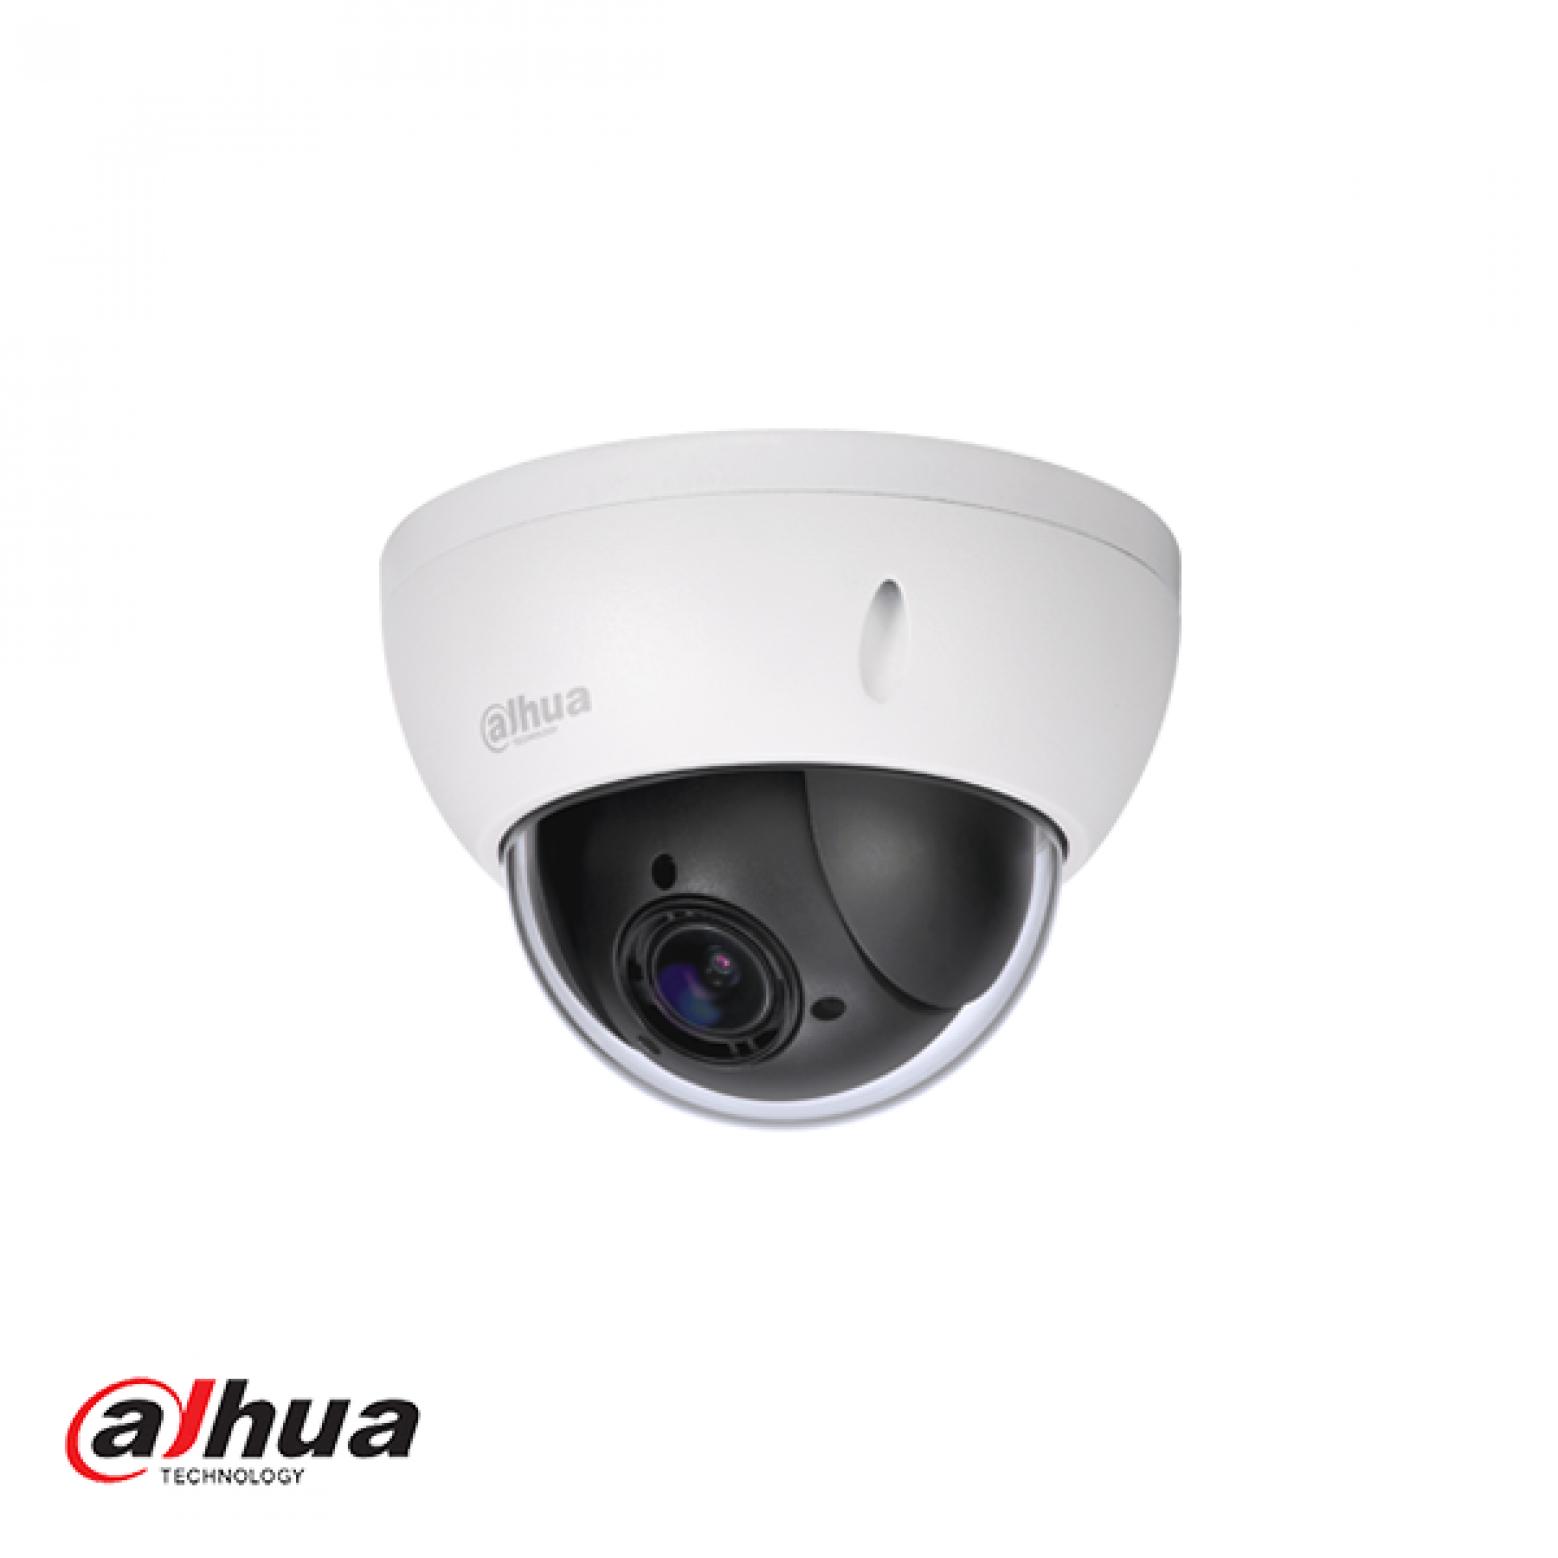 Dahua SD22404T-GN-S2 4MP 4x PTZ Network Camera